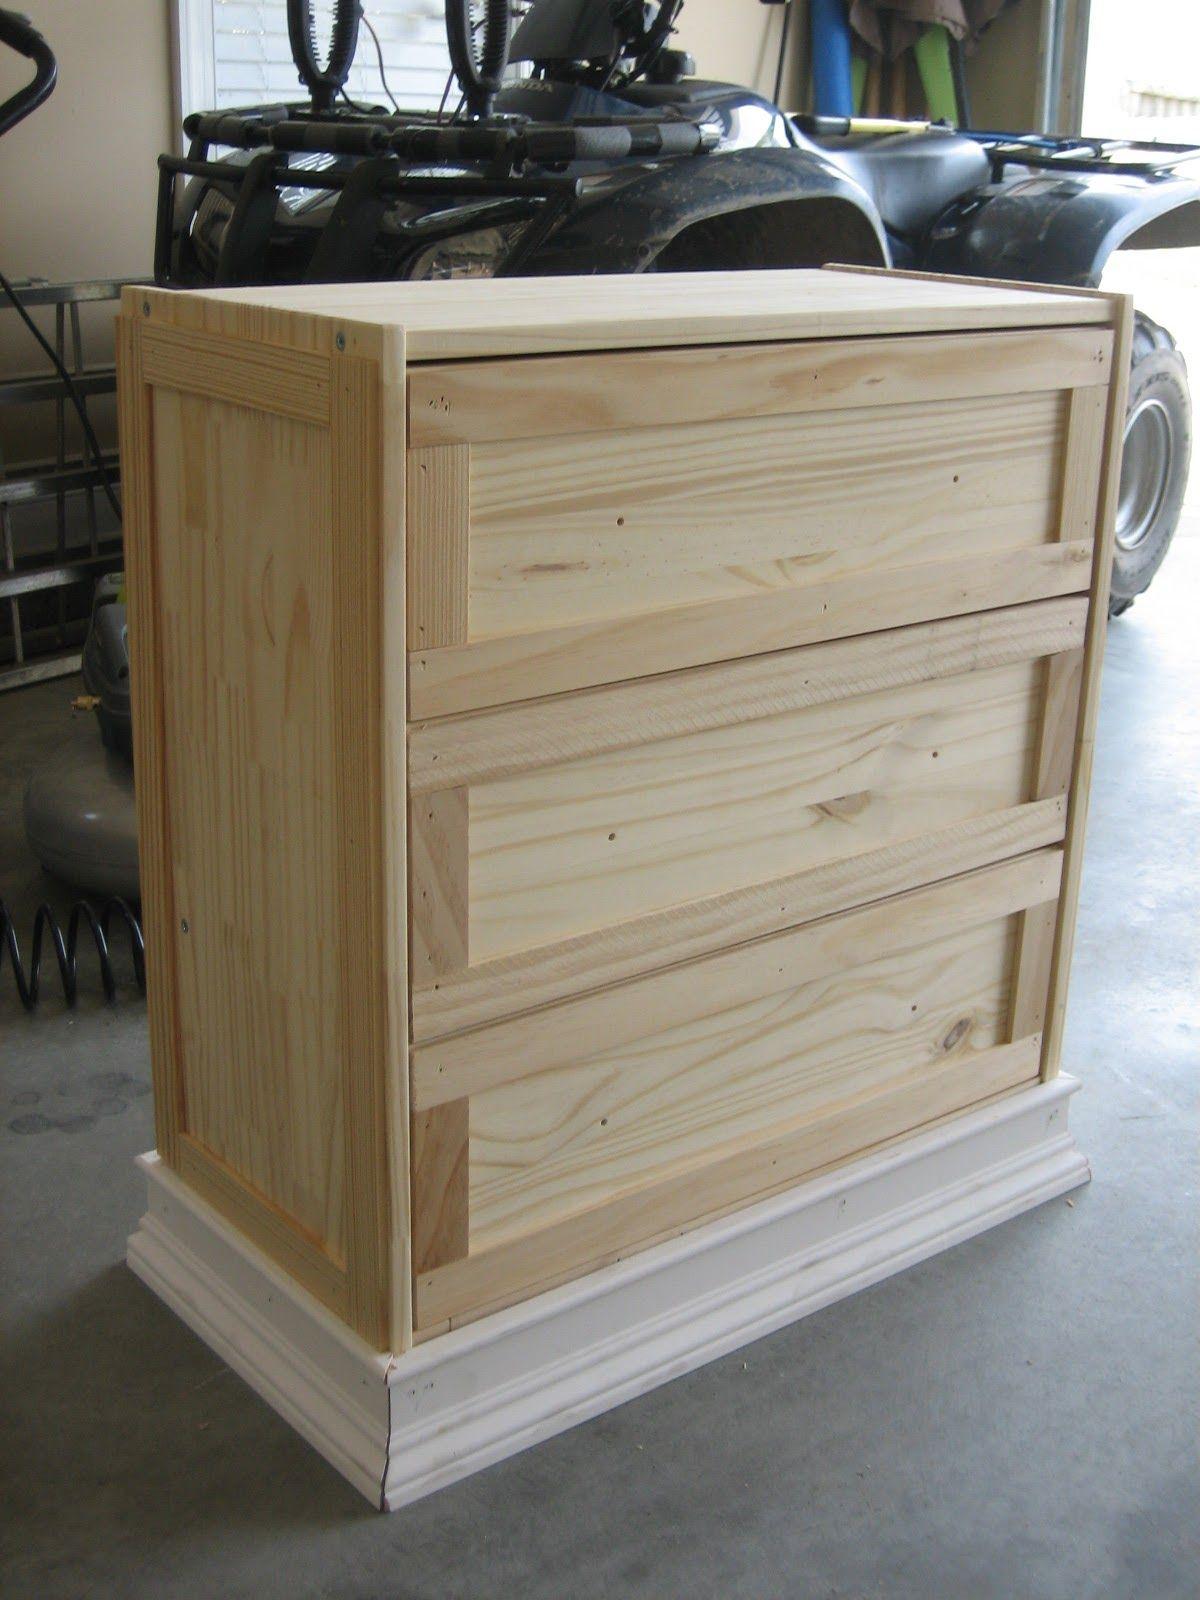 Diy ikea rast bedside dressers furniture pinterest bedside